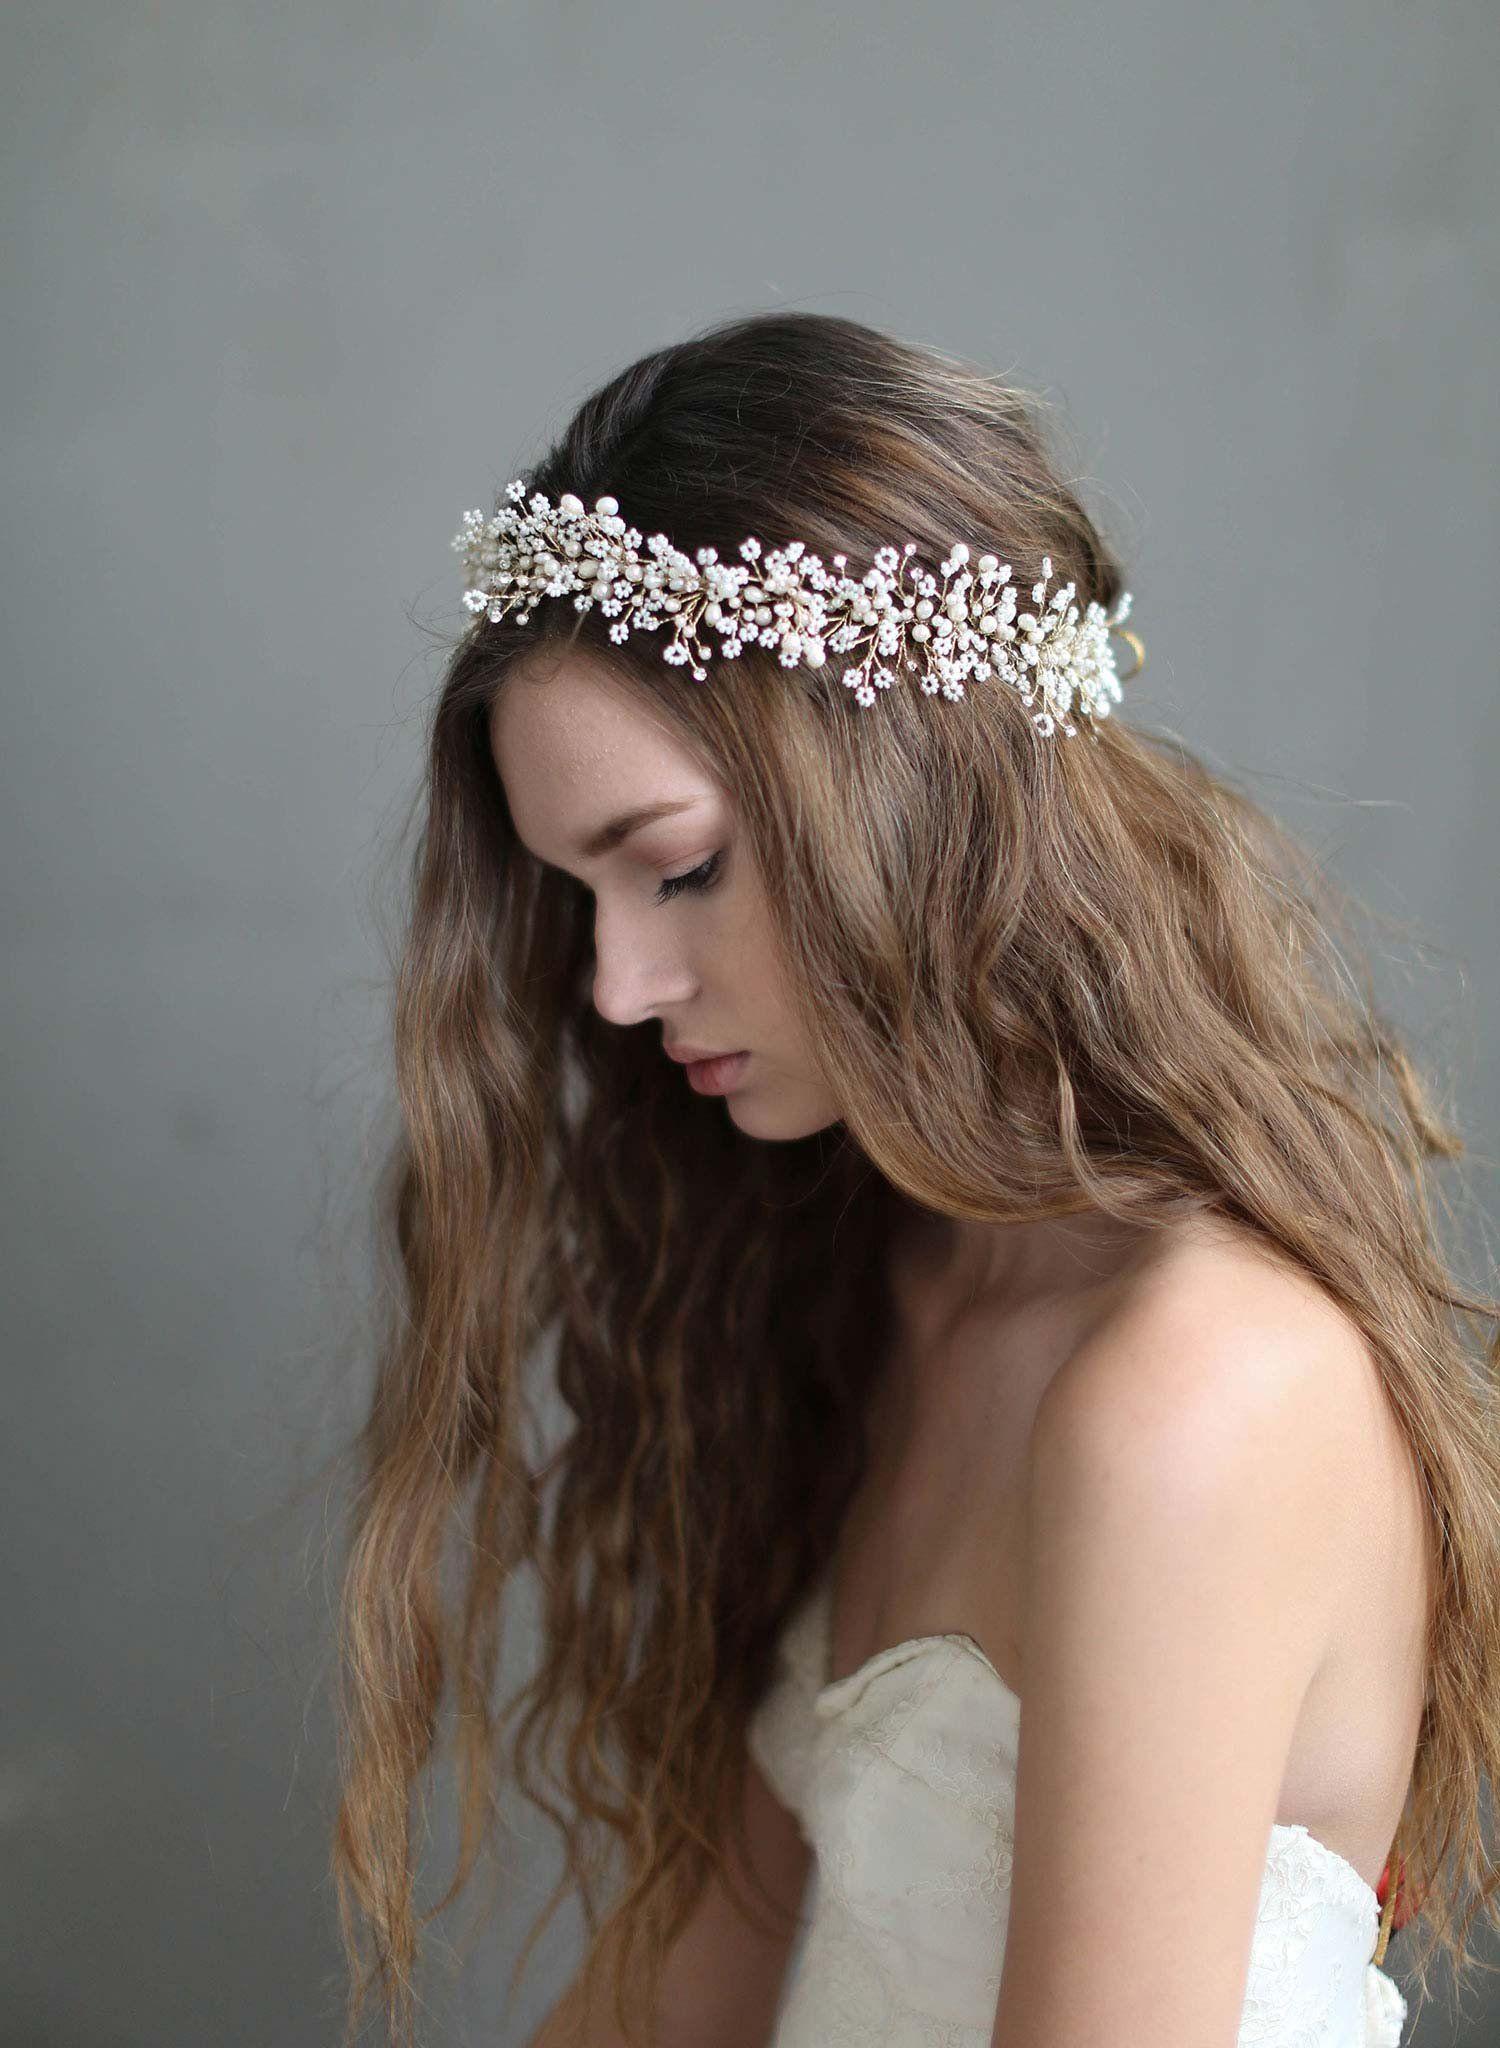 Bridal hair accessories babys breath - Babys Breath Hair